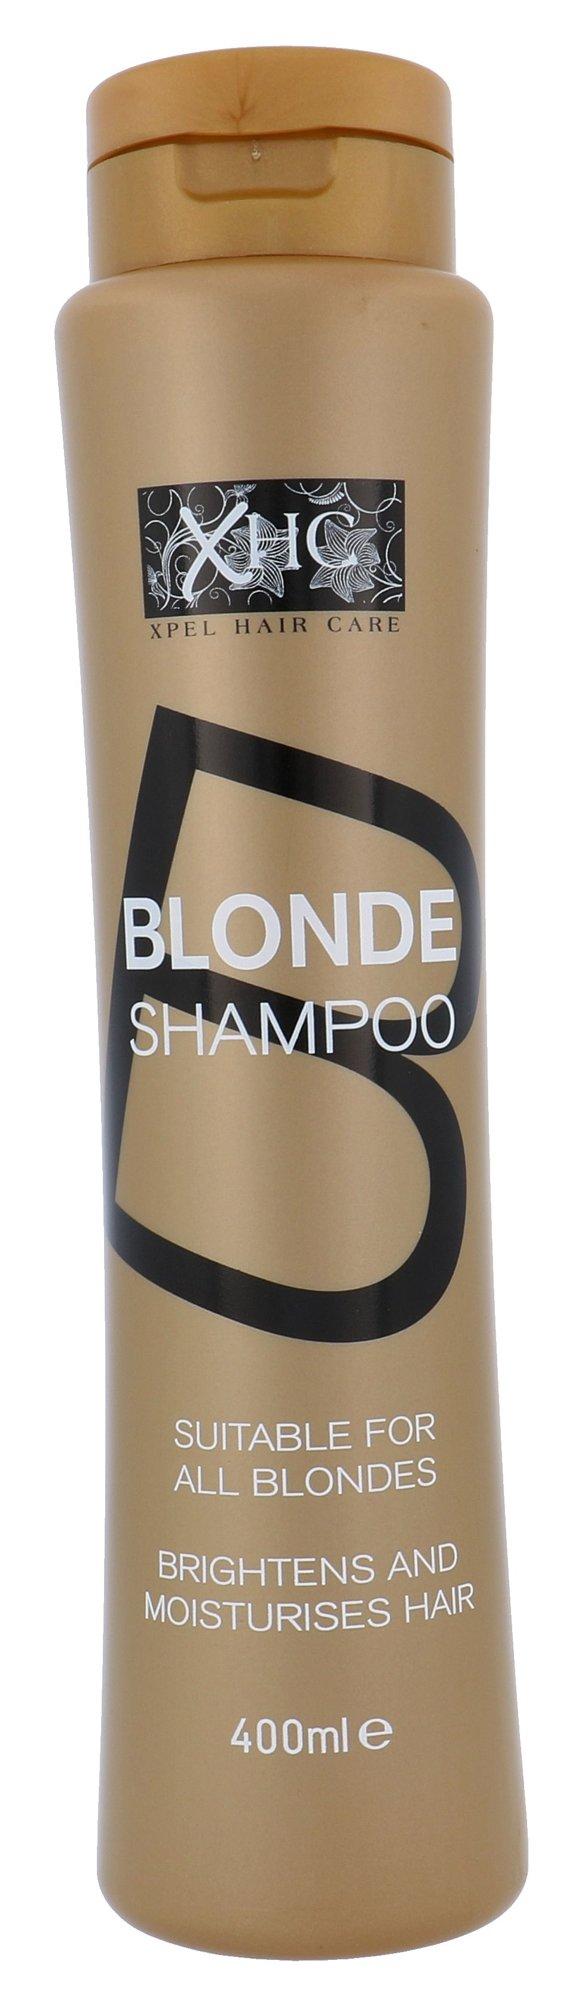 Xpel Blonde Cosmetic 400ml